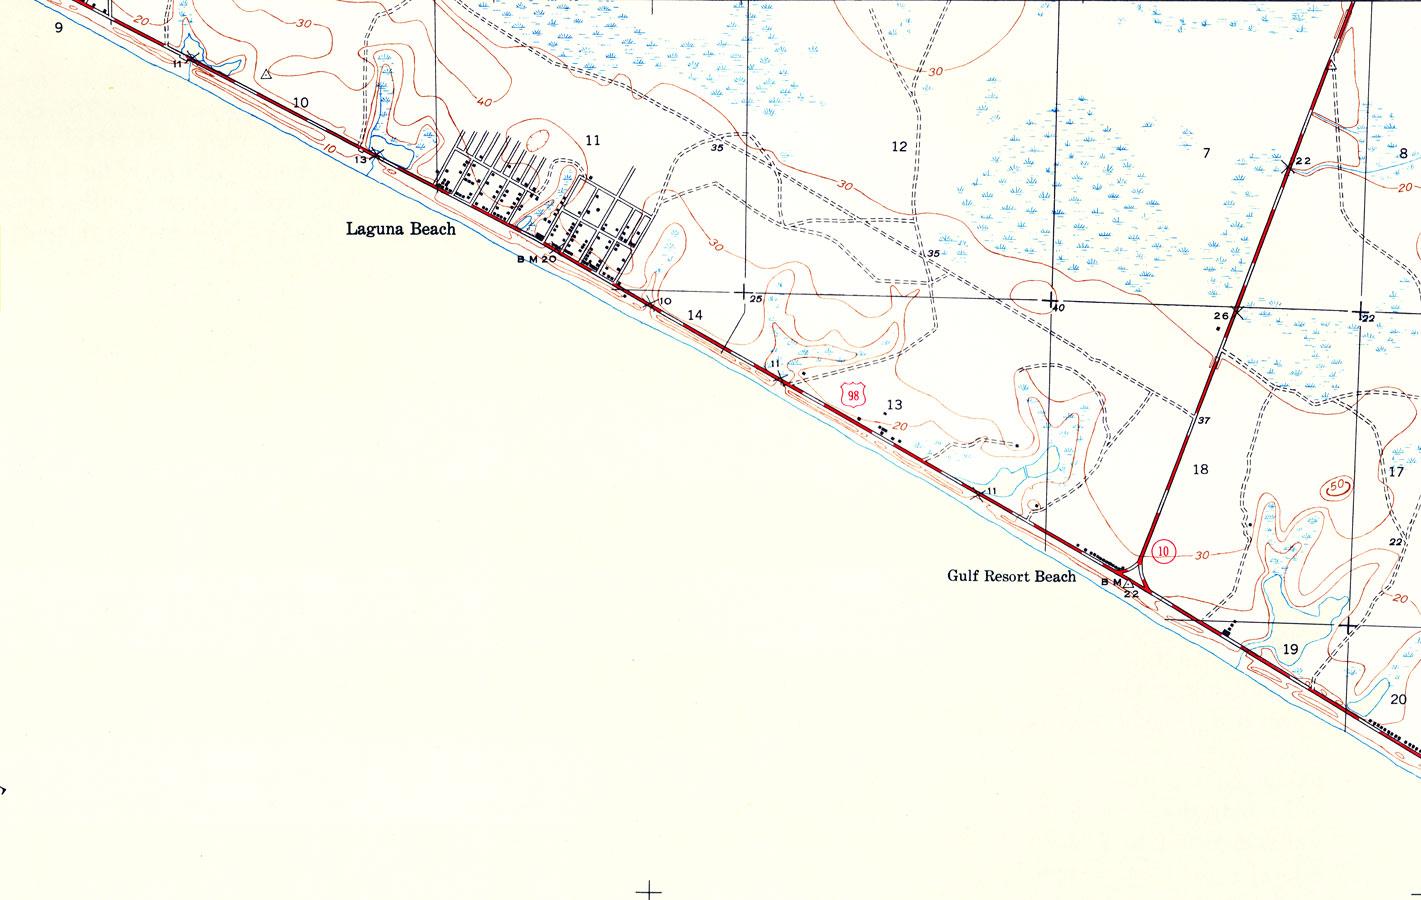 Laguna Beach Florida Map.Laguna Beach Florida 1943